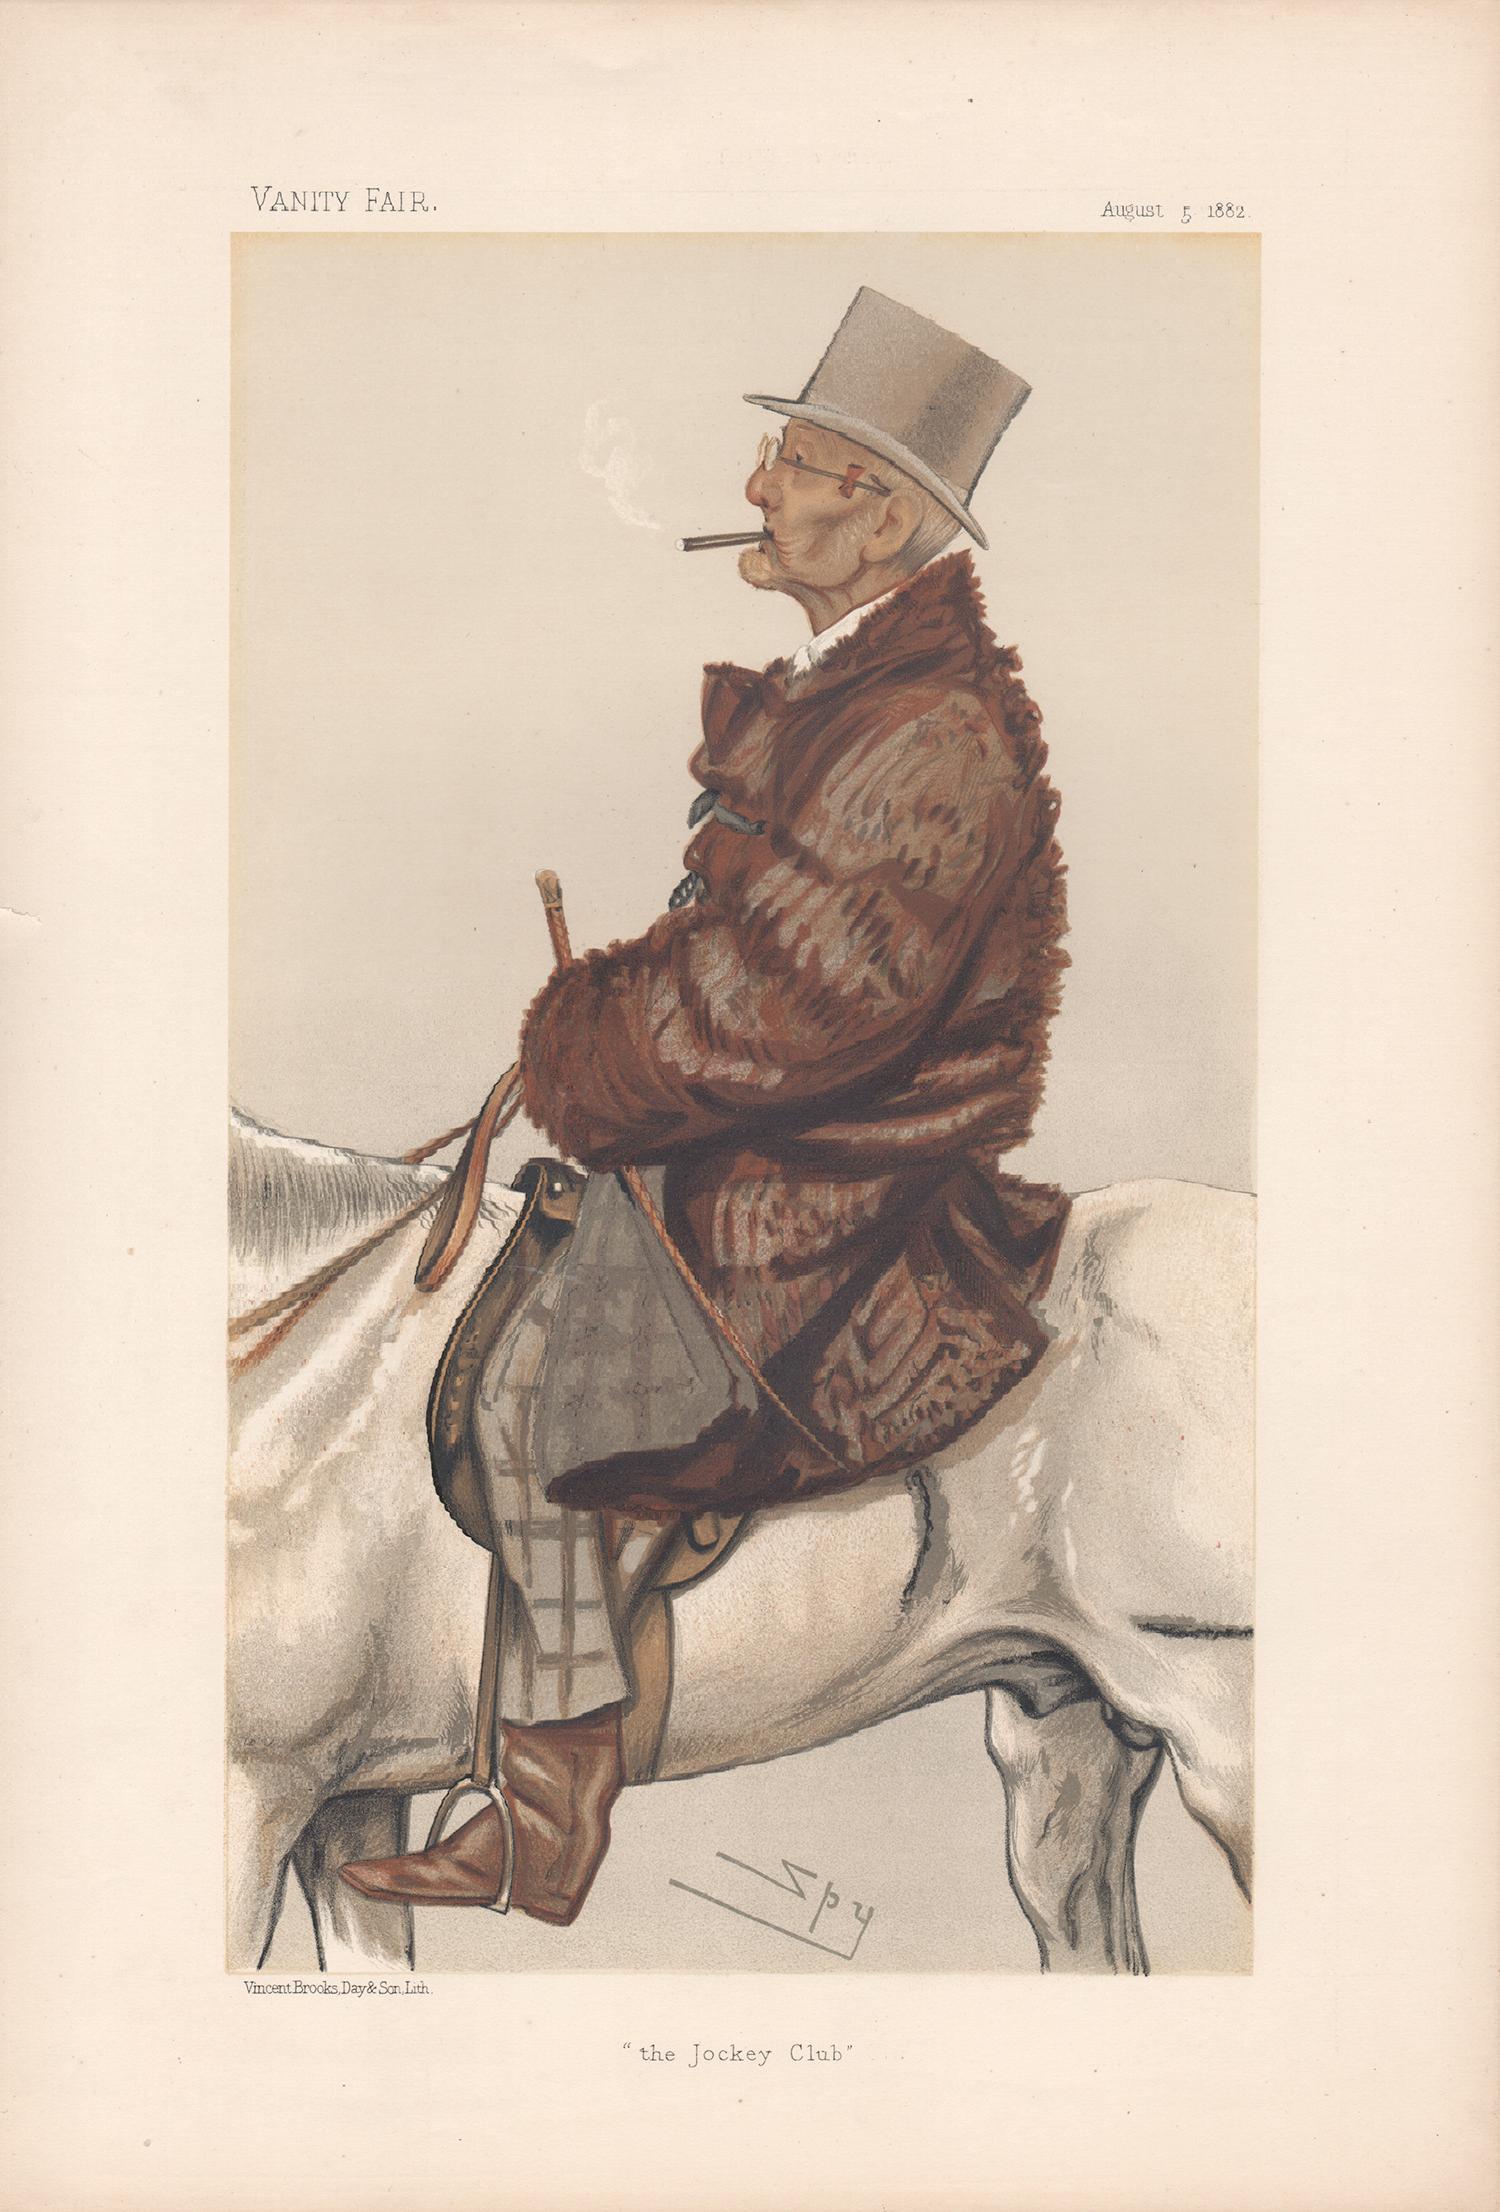 'the Jockey Club', Vanity Fair equestrian portrait chromolithograph, 1903